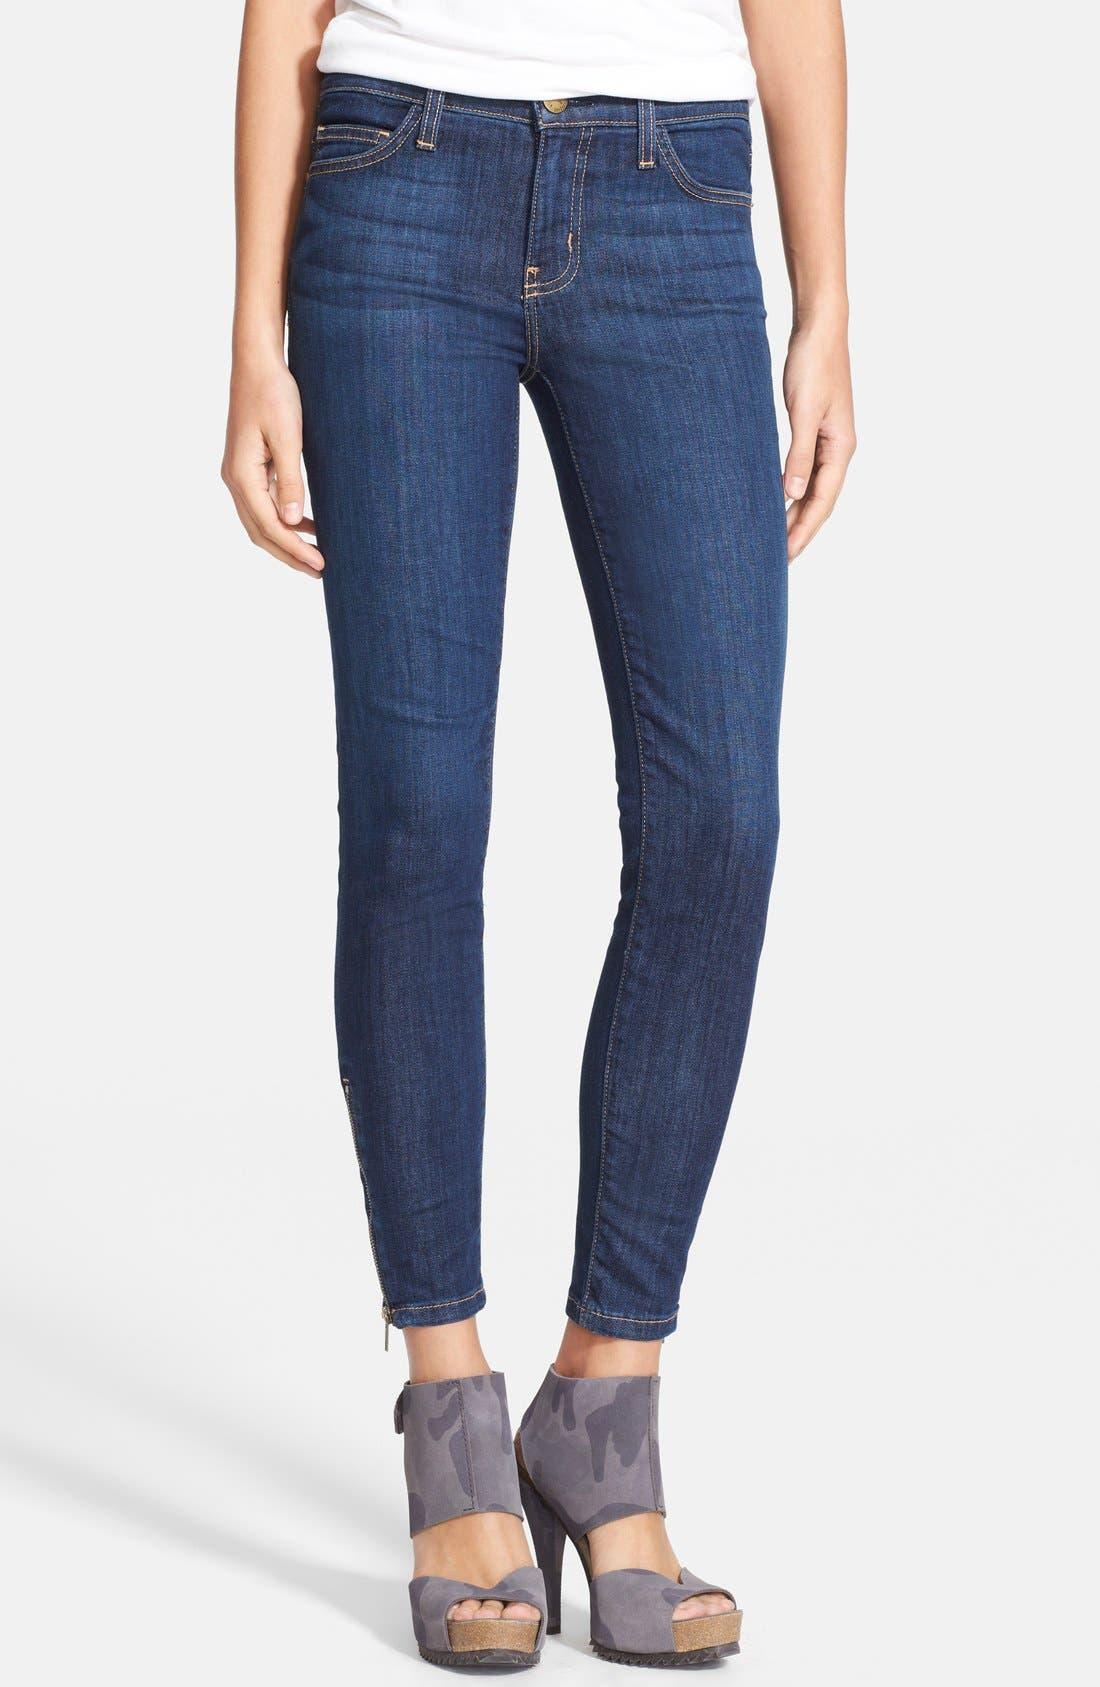 Main Image - Current/Elliott 'The Zip Stiletto' Skinny Jeans (Bowler)